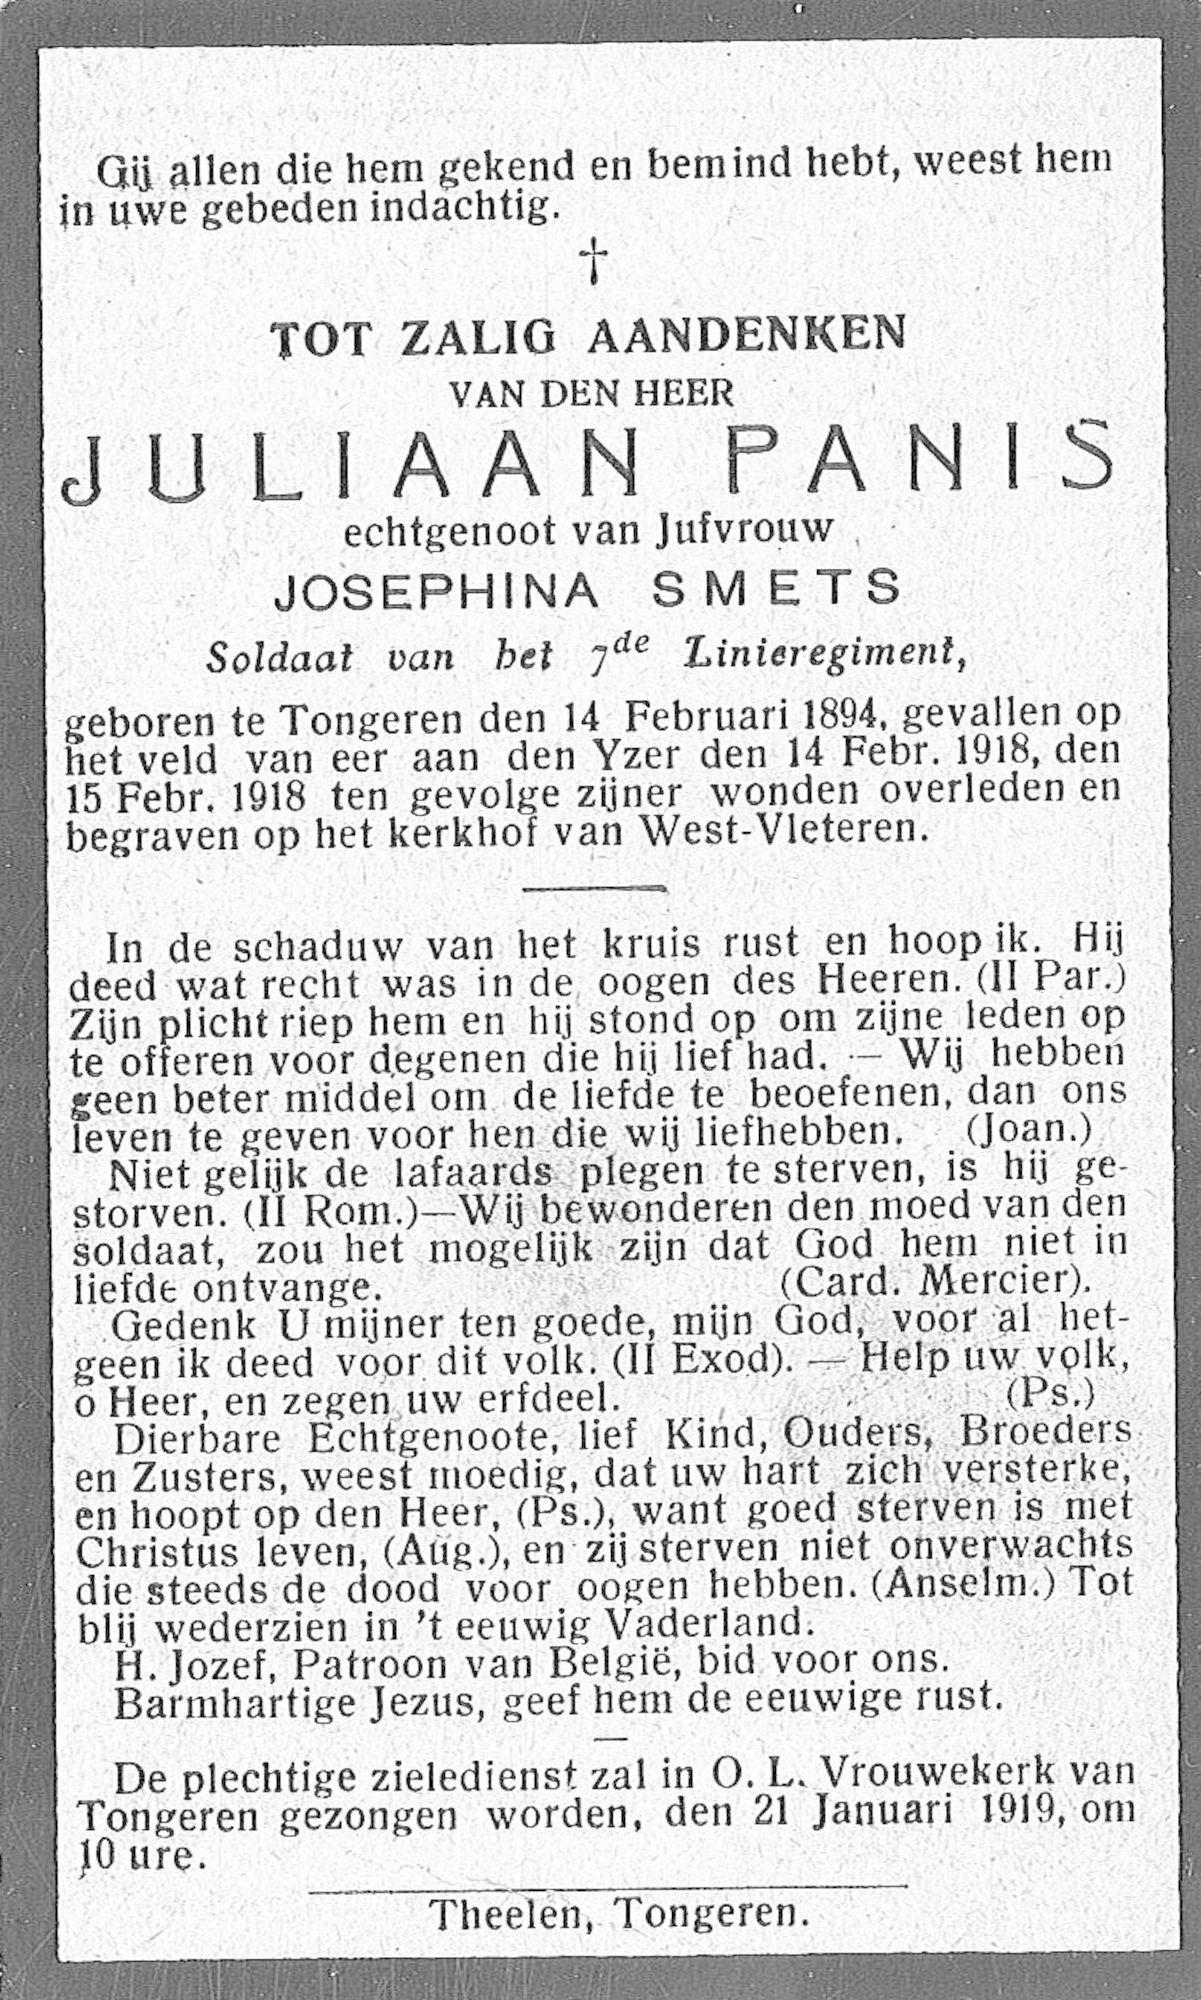 Panis Juliaan